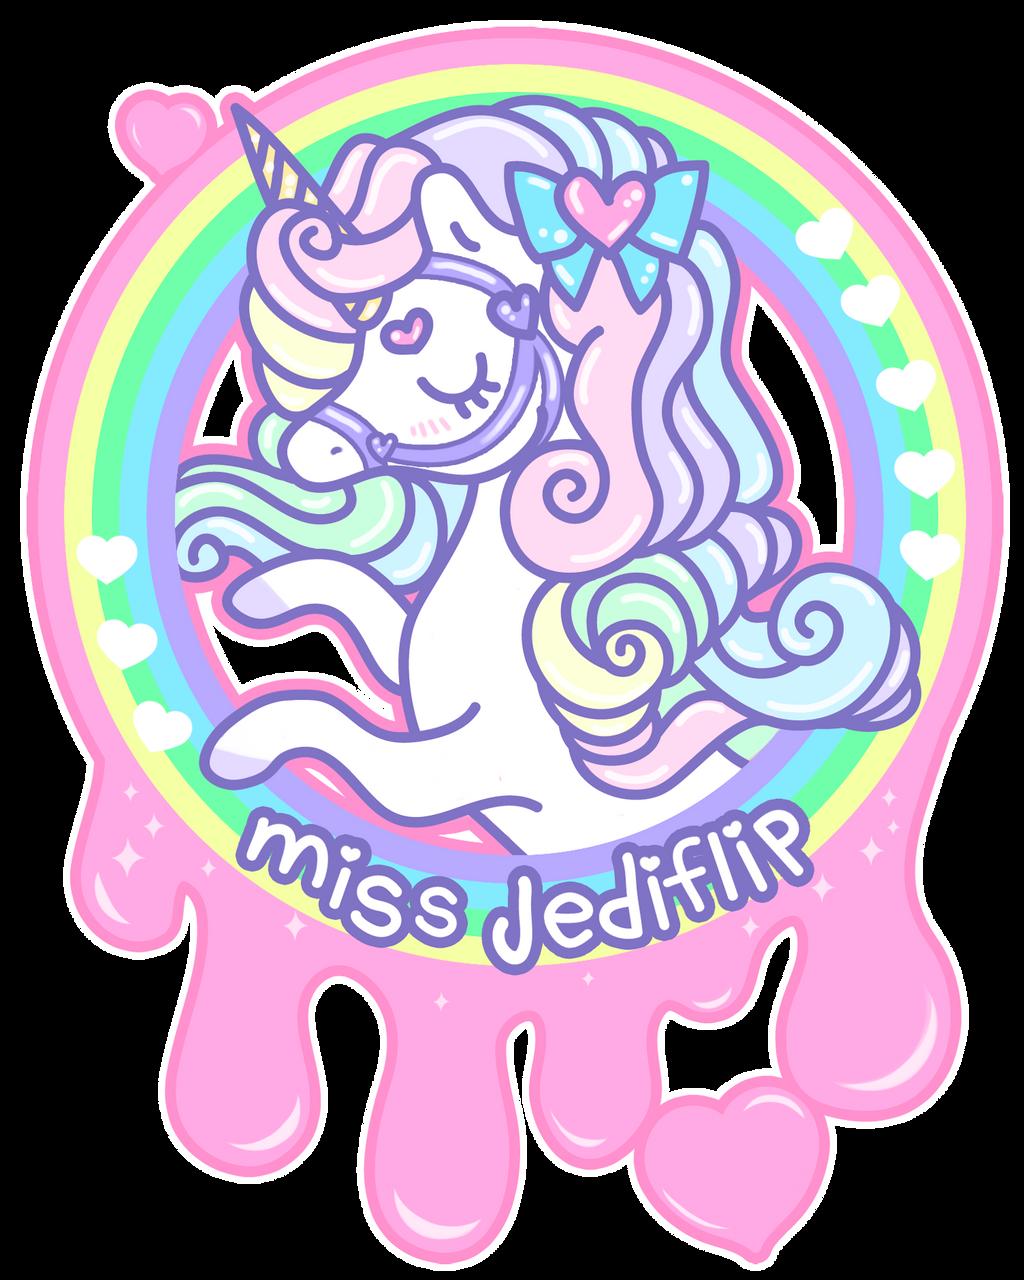 Rainbow Unicorn Logo by MissJediflip on DeviantArt